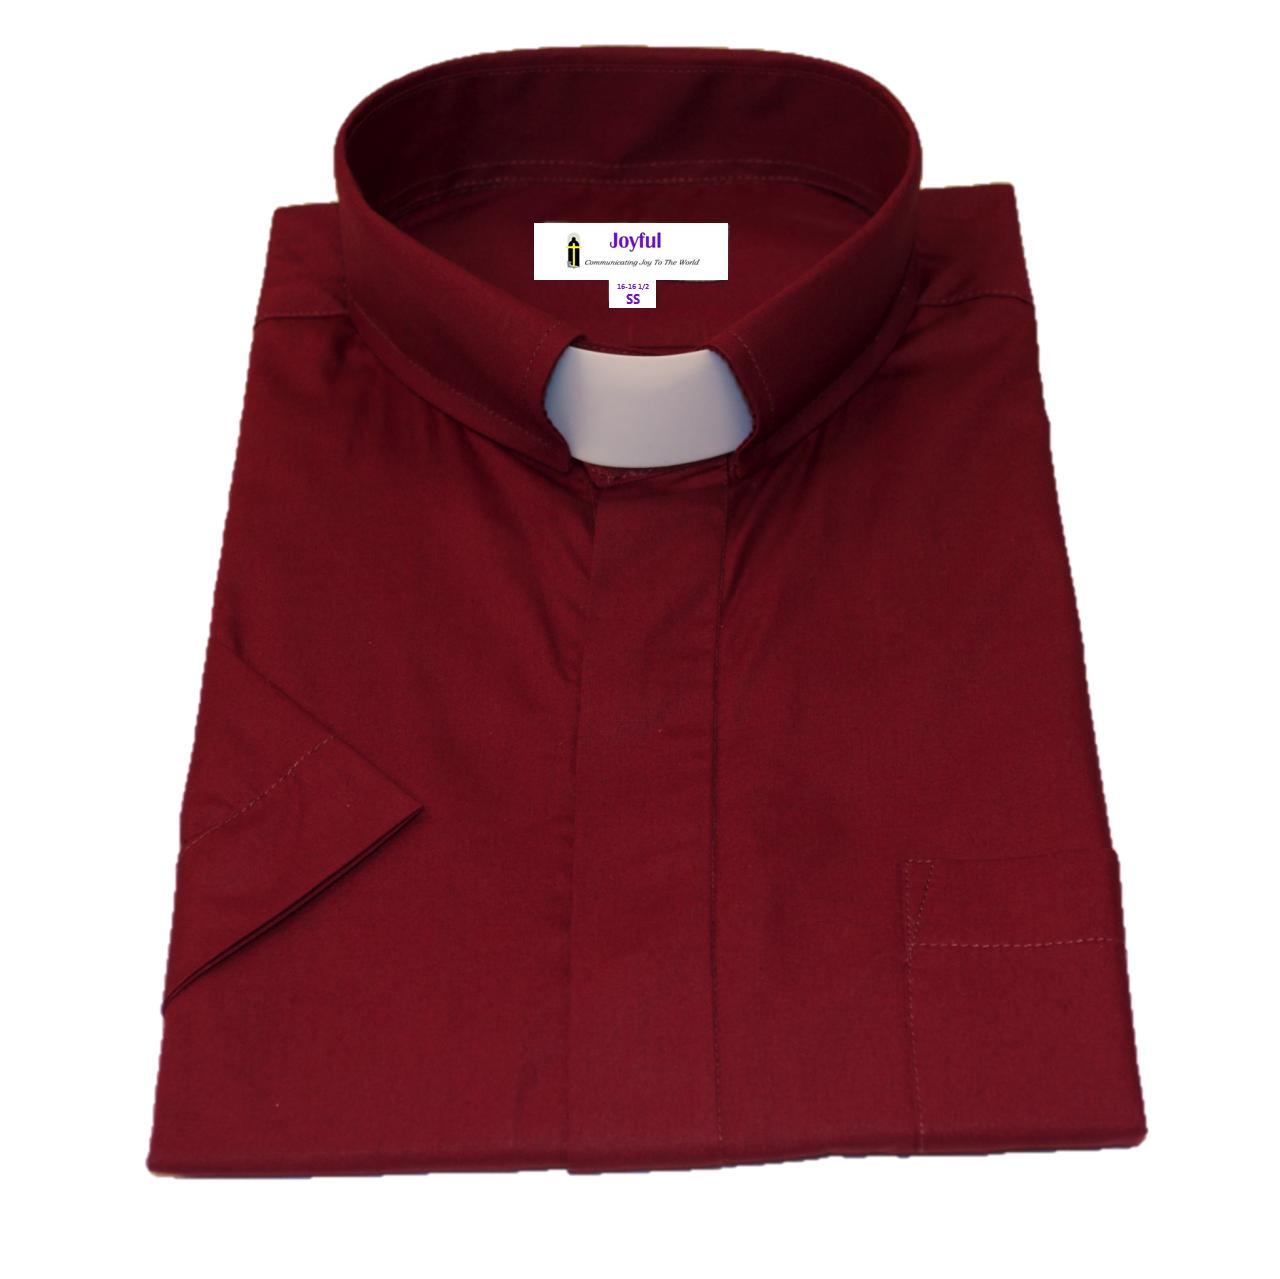 Men 39 S Short Sleeve Tab Collar Clergy Shirt Burgundy